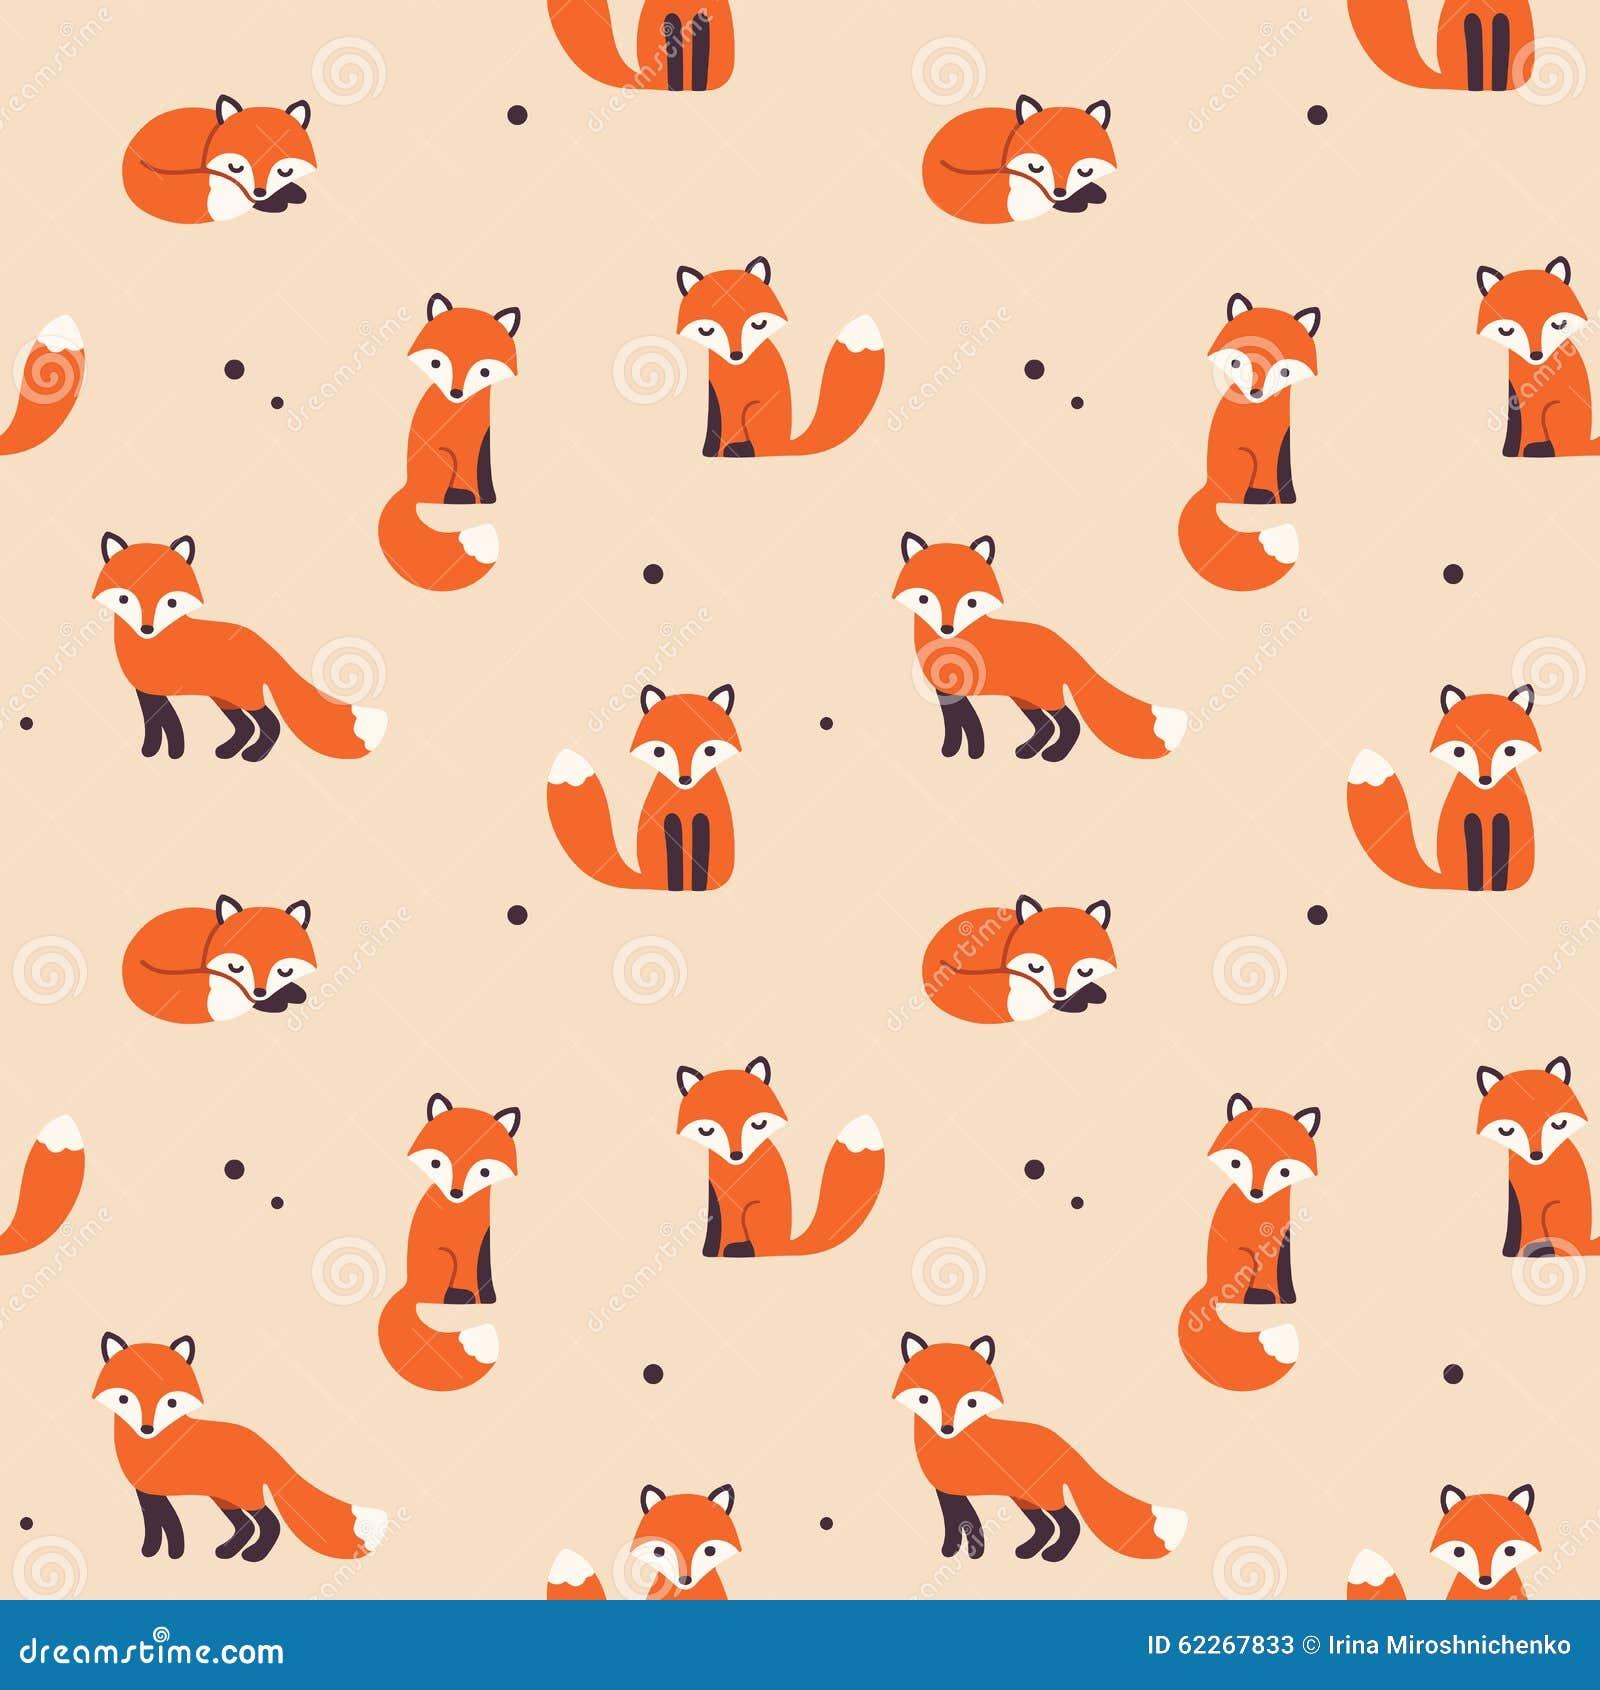 Seamless Fox Pattern Stock Vector - Image: 62267833